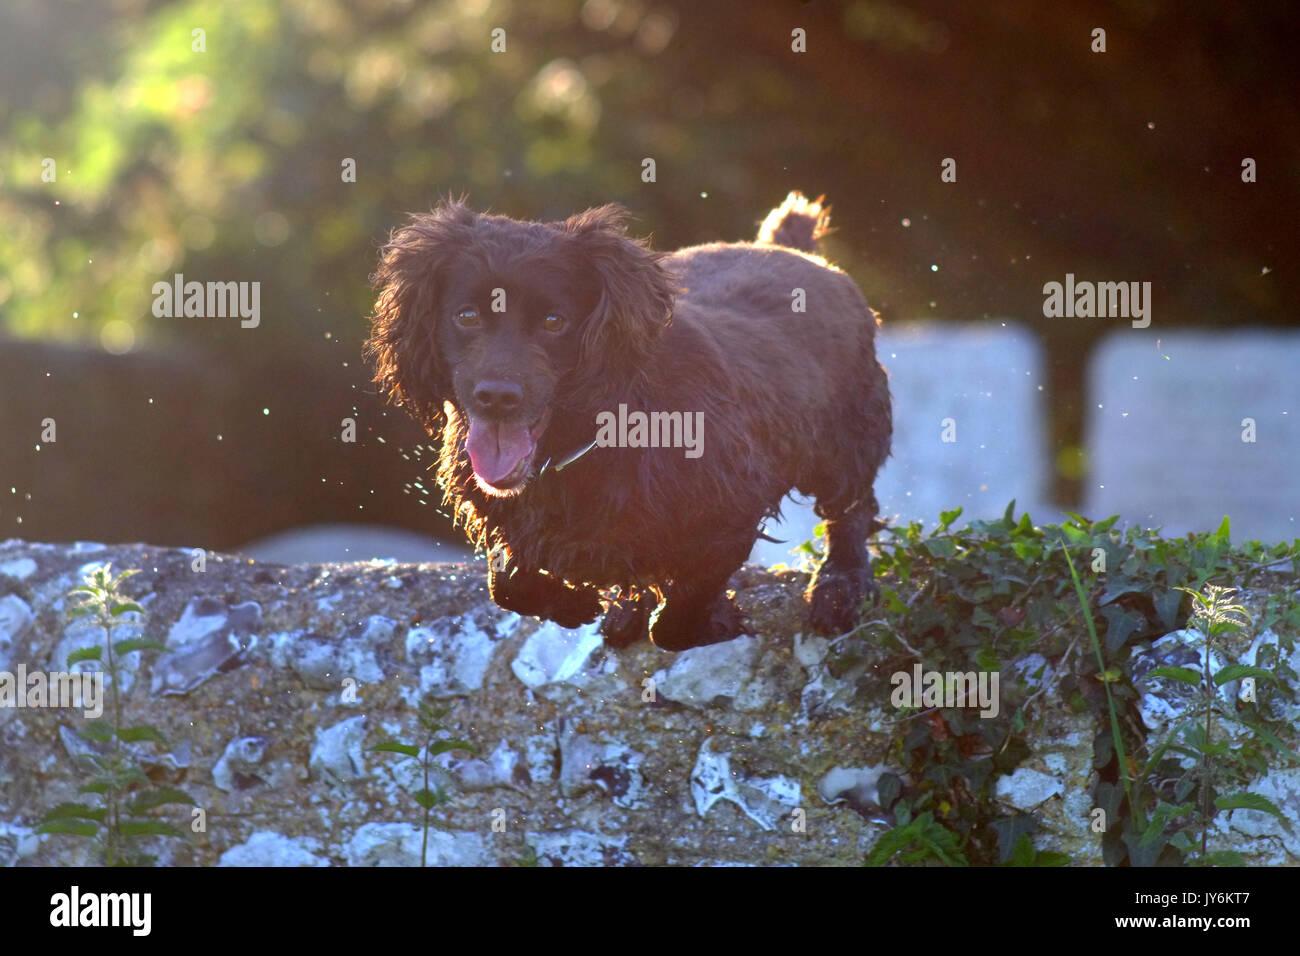 Cocker spaniel jumping over a flint wall - Stock Image